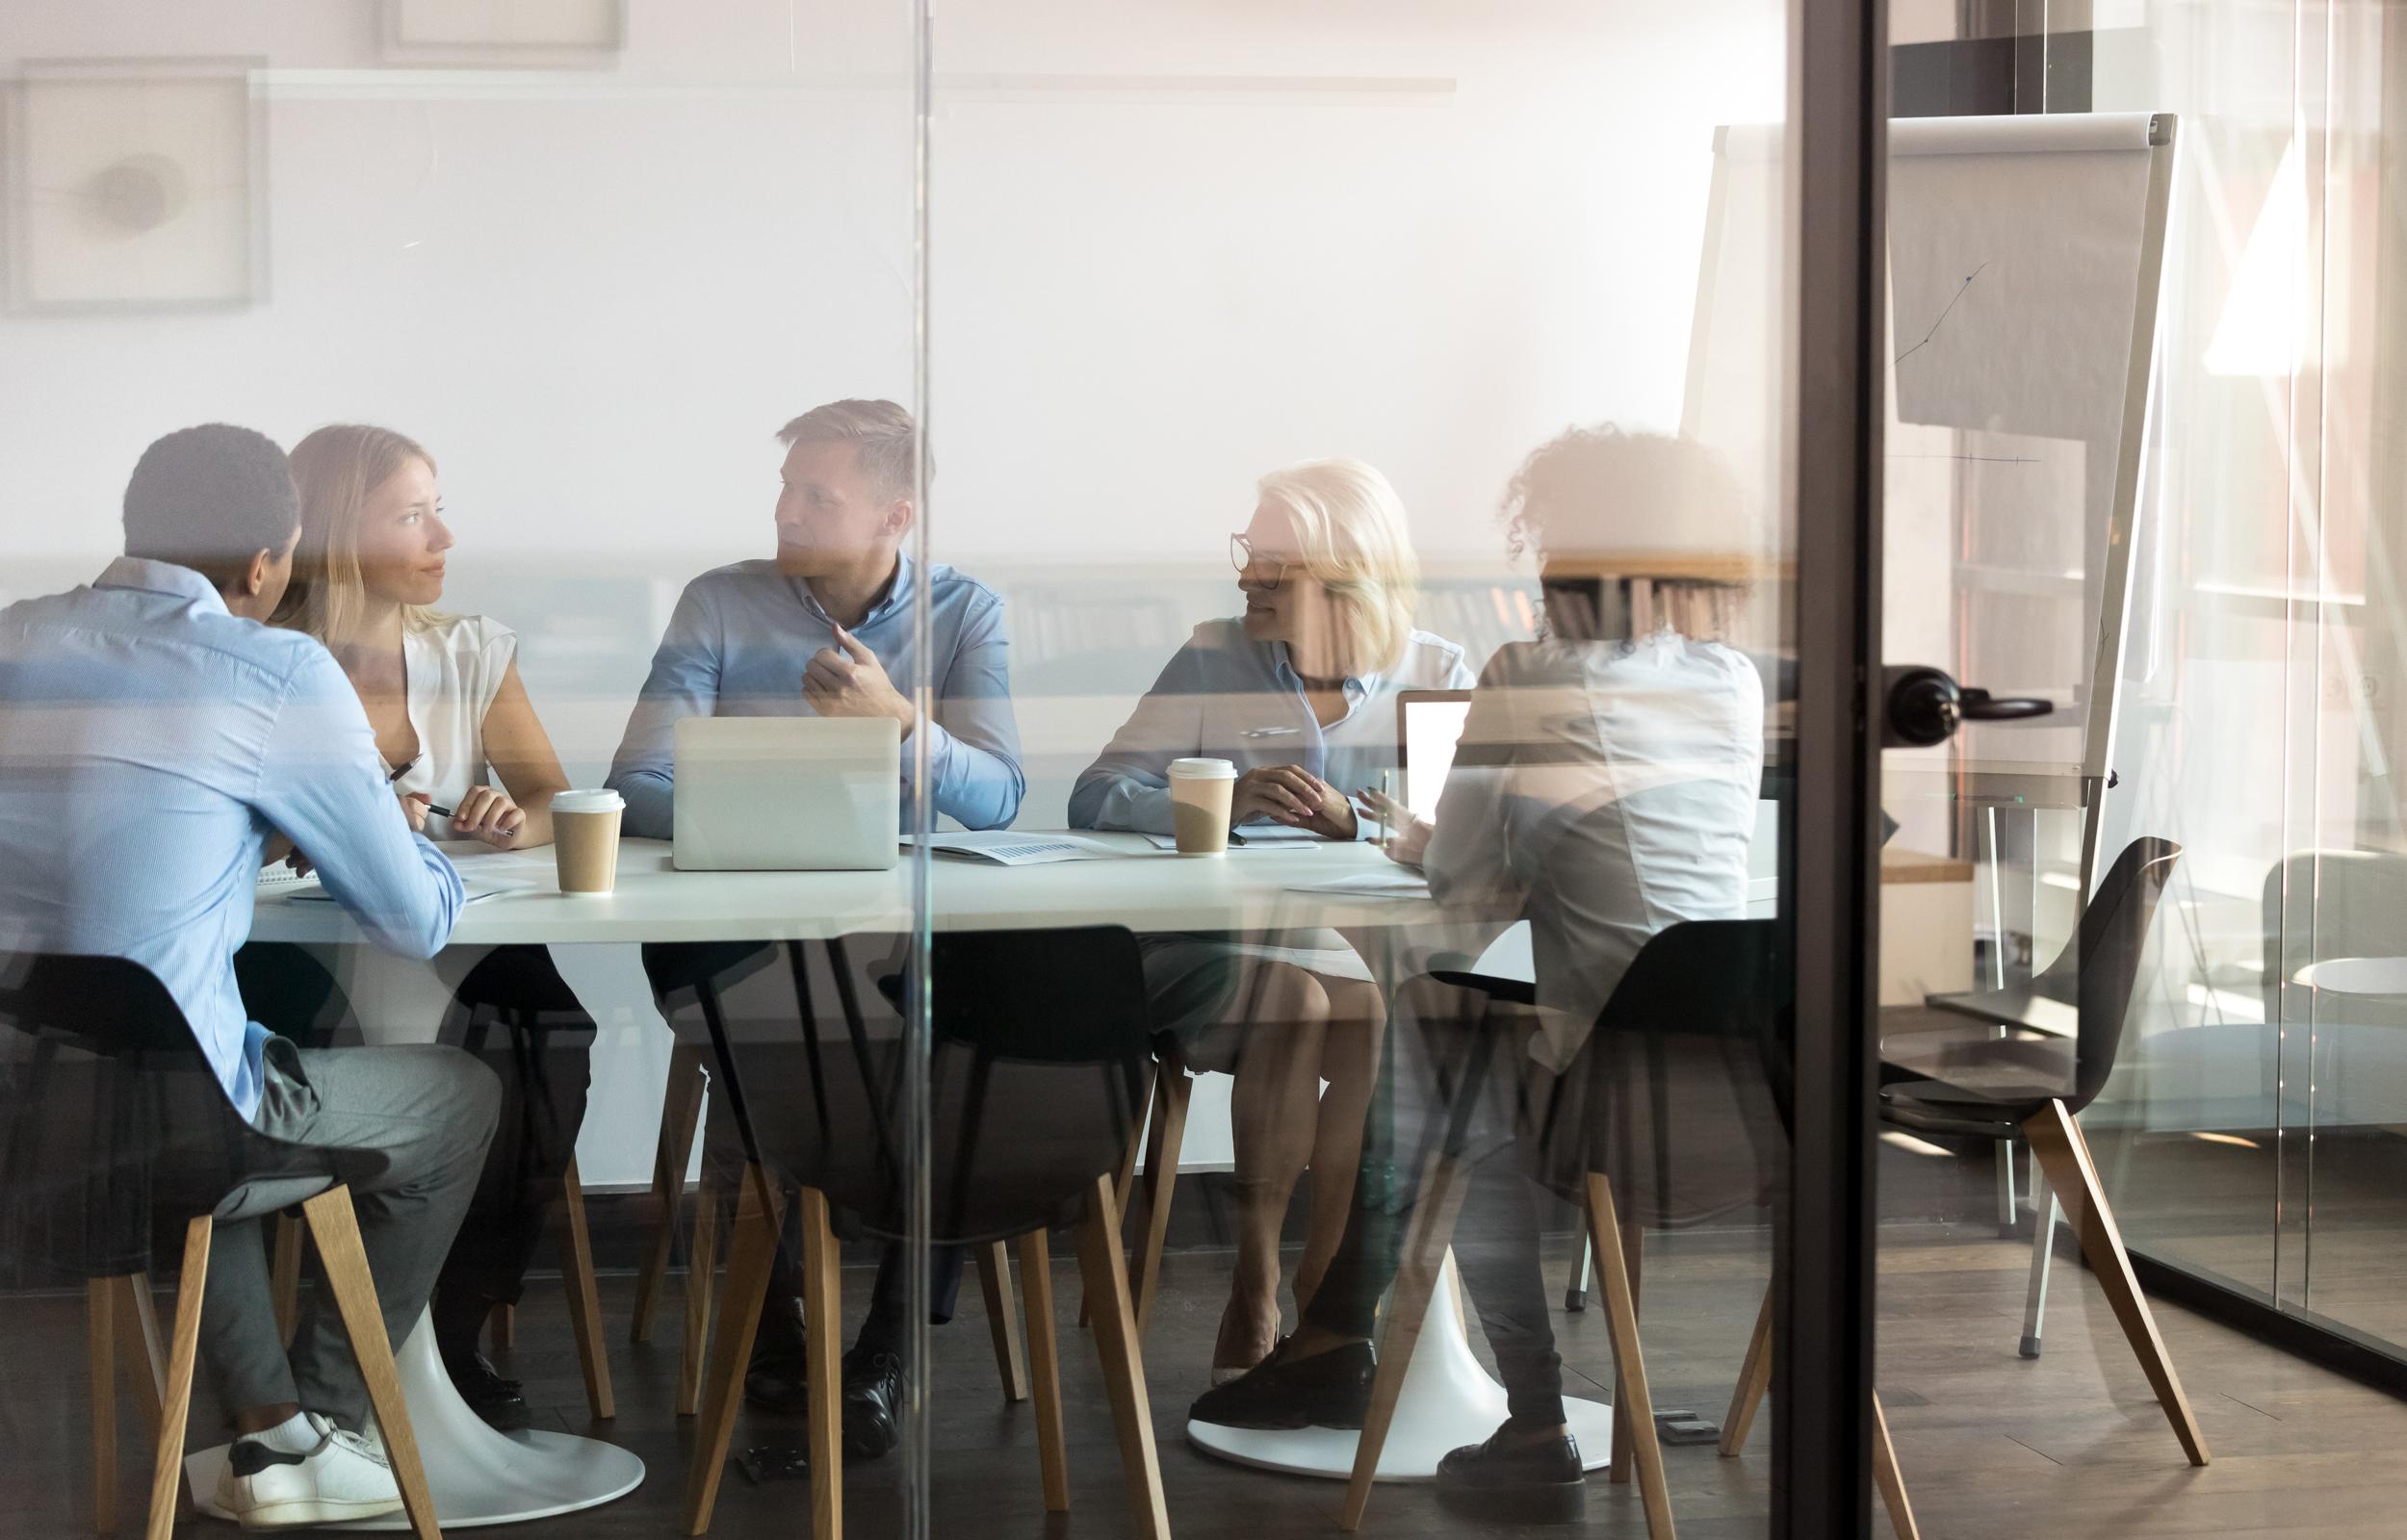 Business people negotiating at boardroom behind closed doors